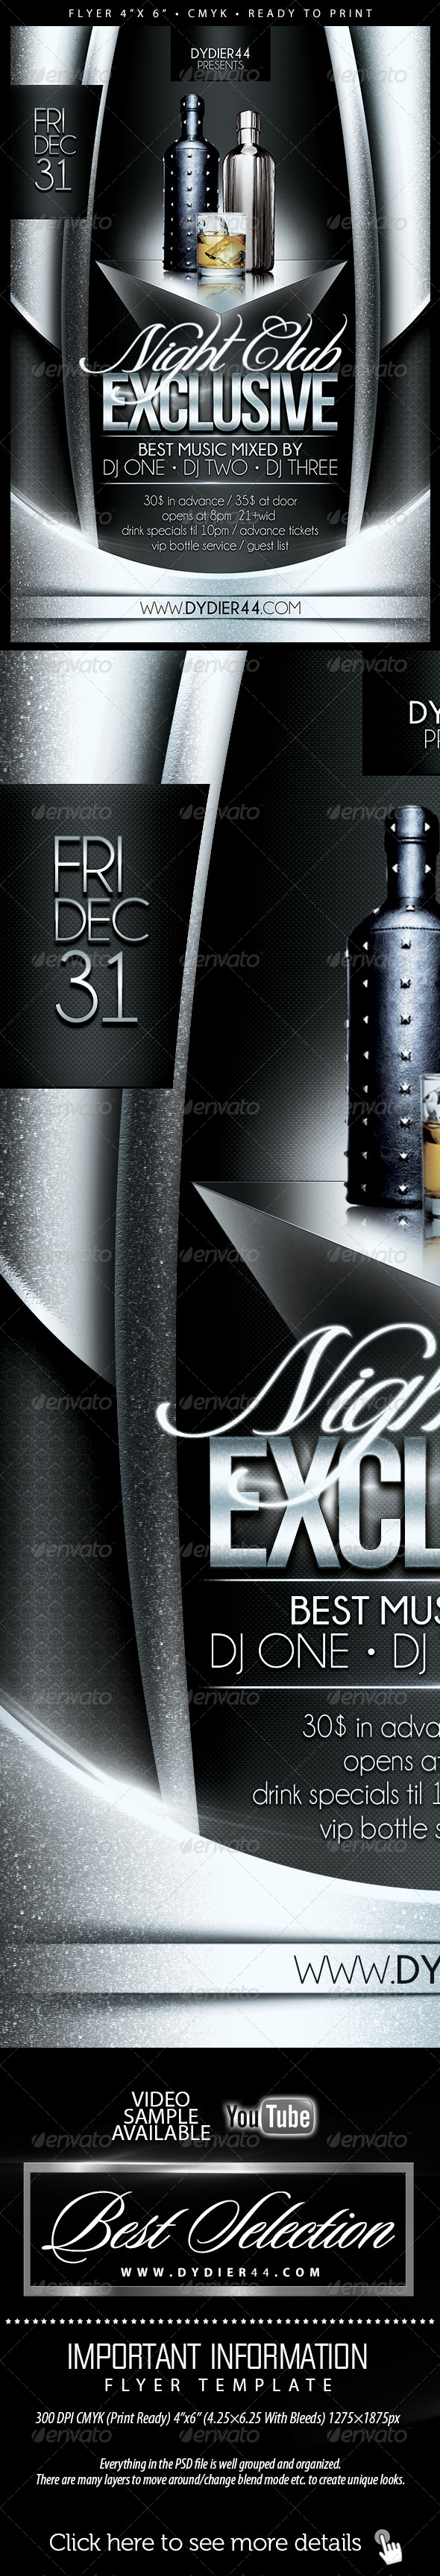 GraphicRiver Nightclub Exclusive Flyer Template 4x6 6289164